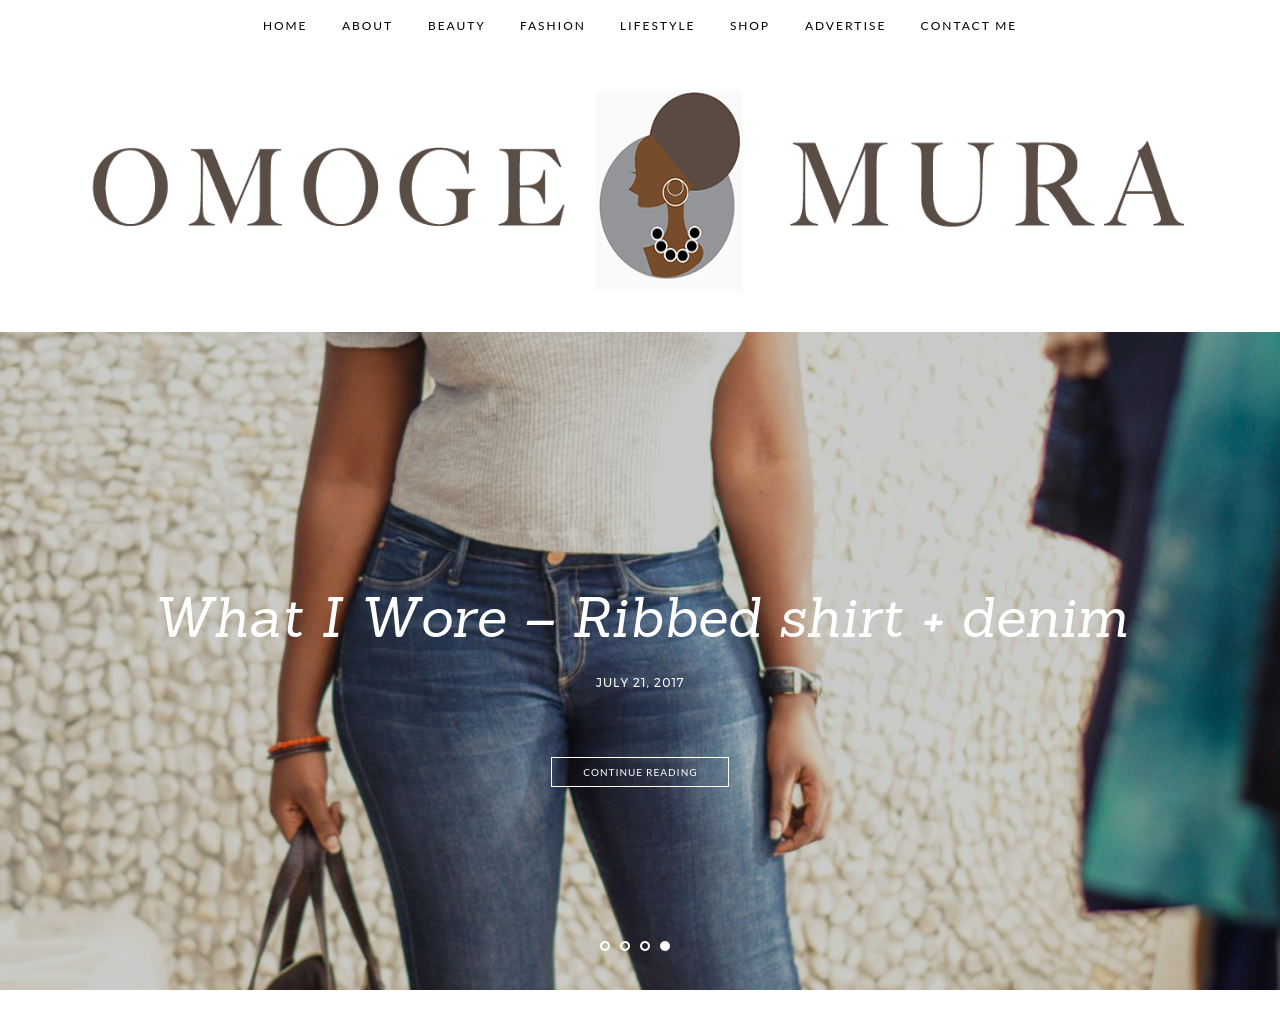 Omoge-Mura-Advertising-Reviews-Pricing